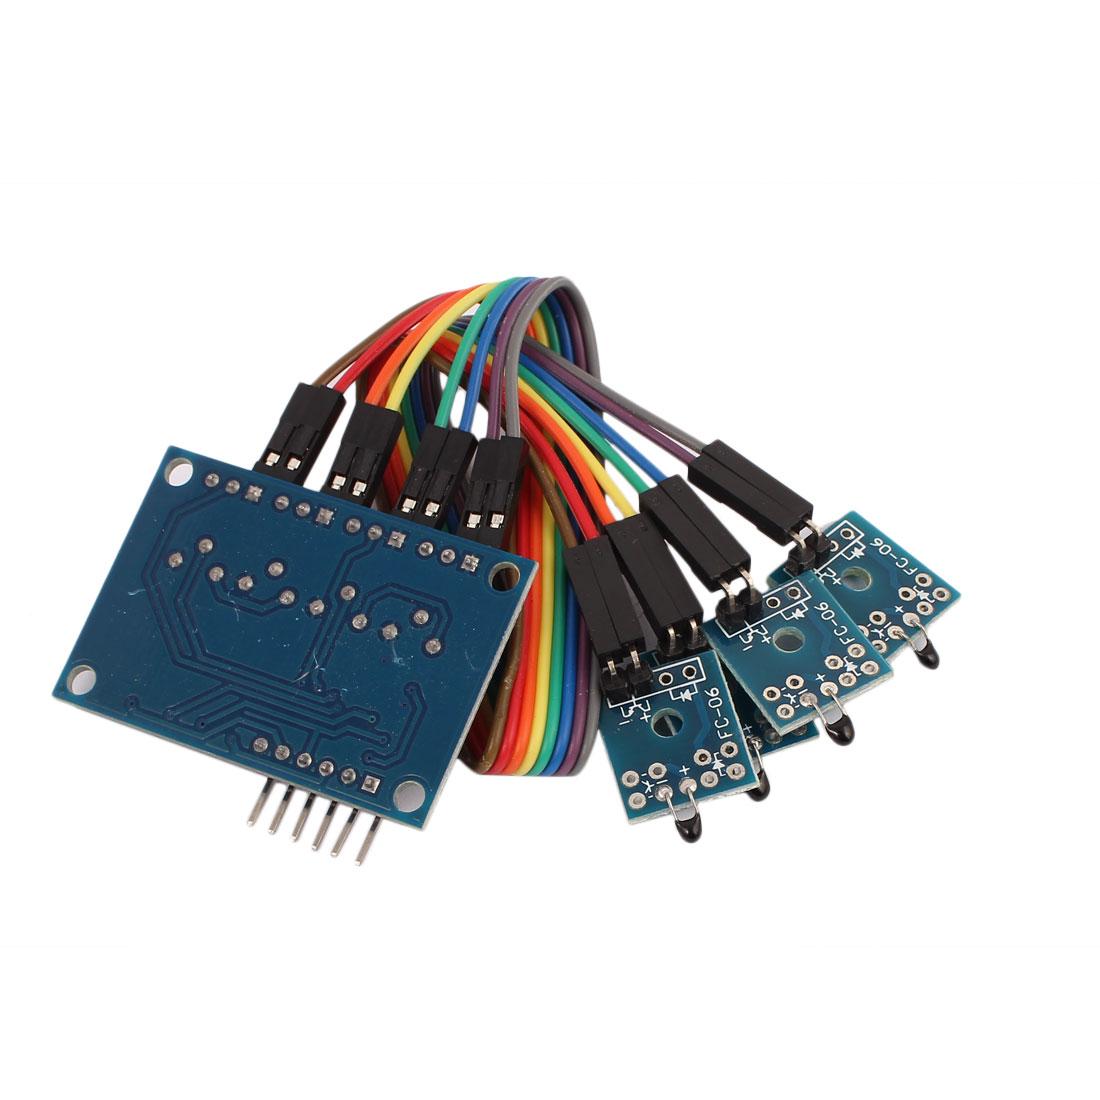 Hall Sensor  4-Way Switch Speed Counting Module - image 1 de 3